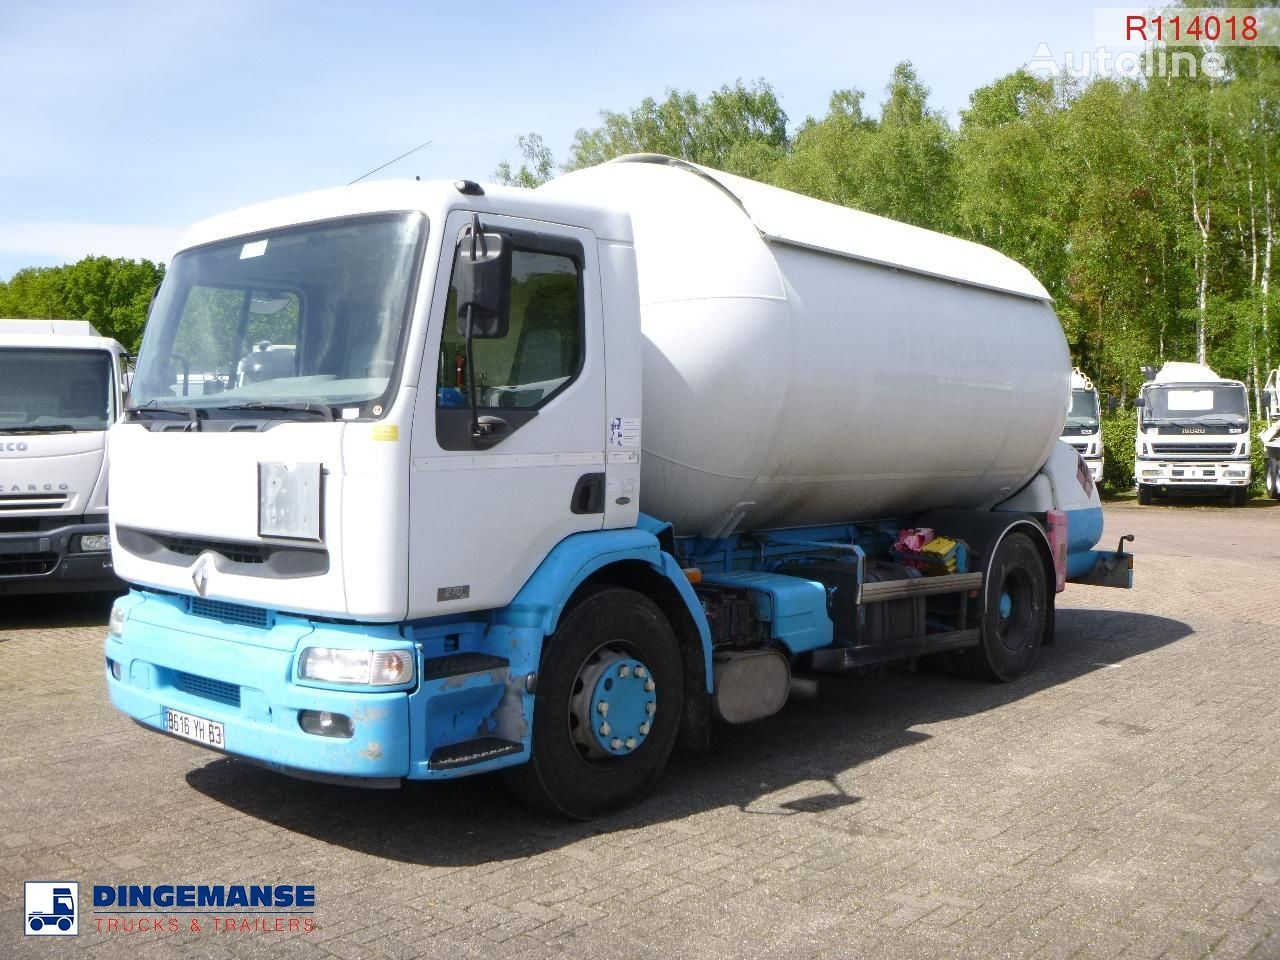 камион газовоз RENAULT Premium 270 4x2 gas tank 19.7 m3